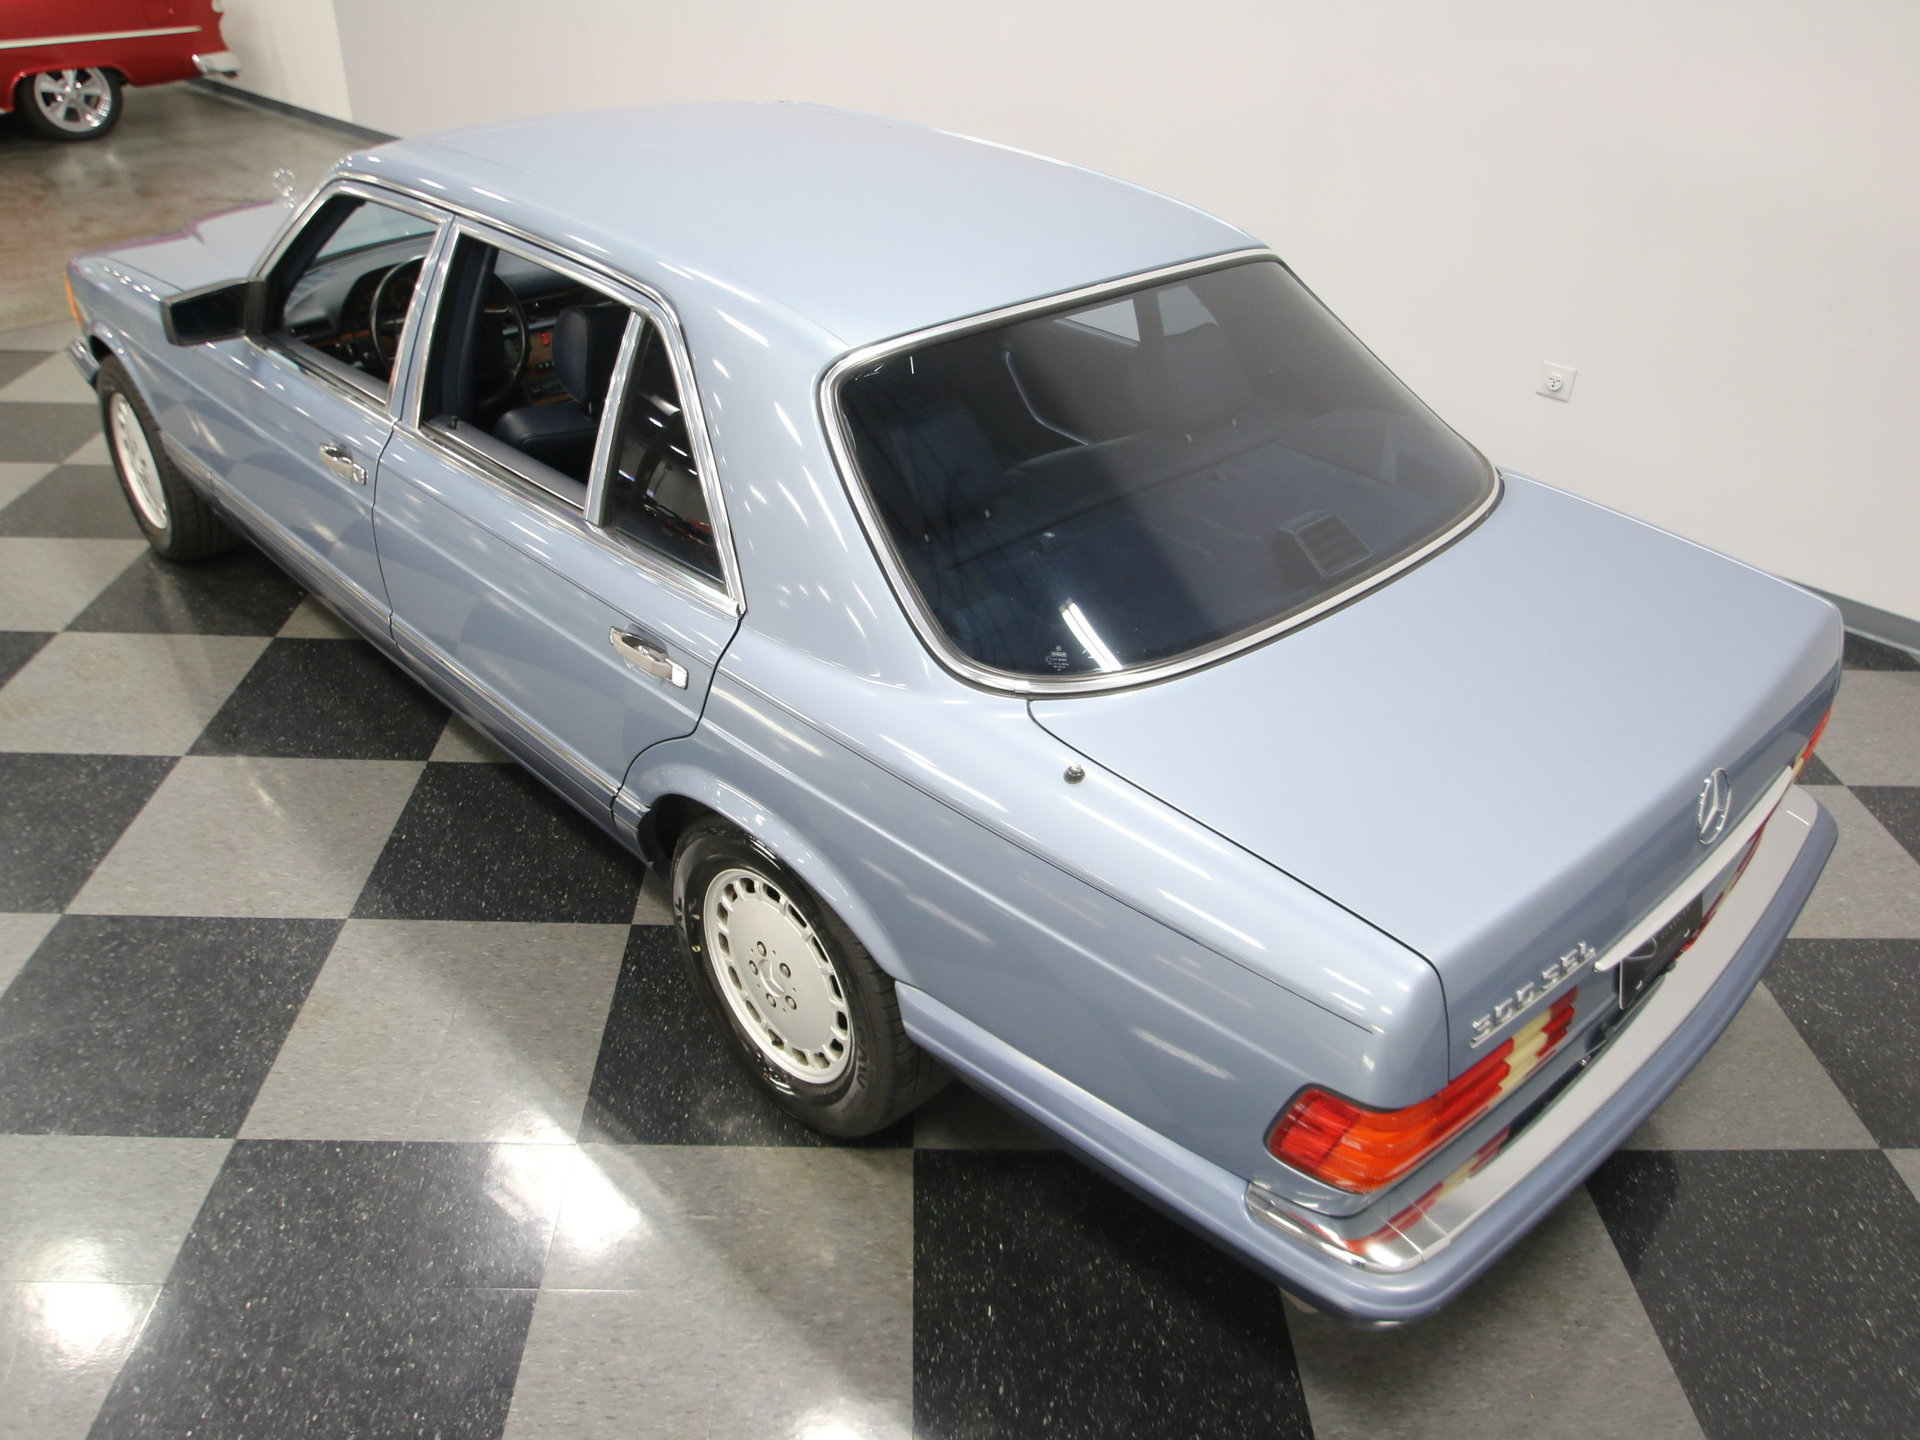 1989 Mercedes Benz 300 Sel Streetside Classics The Nations 1991 500sl Timing Belt View 360